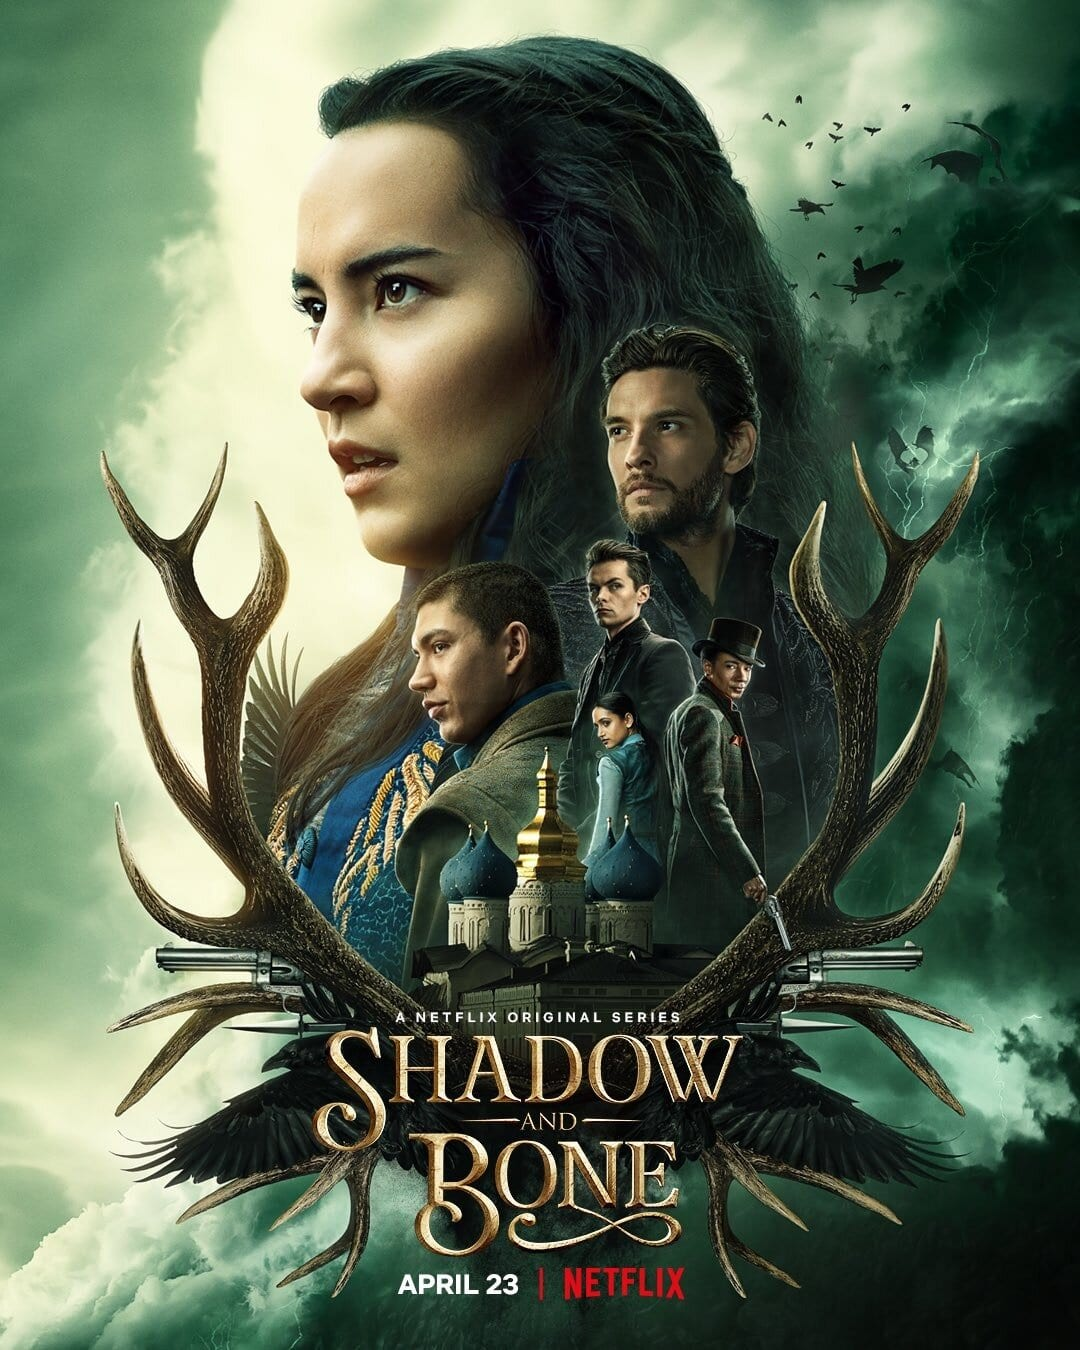 Shadow and Bone teaser image